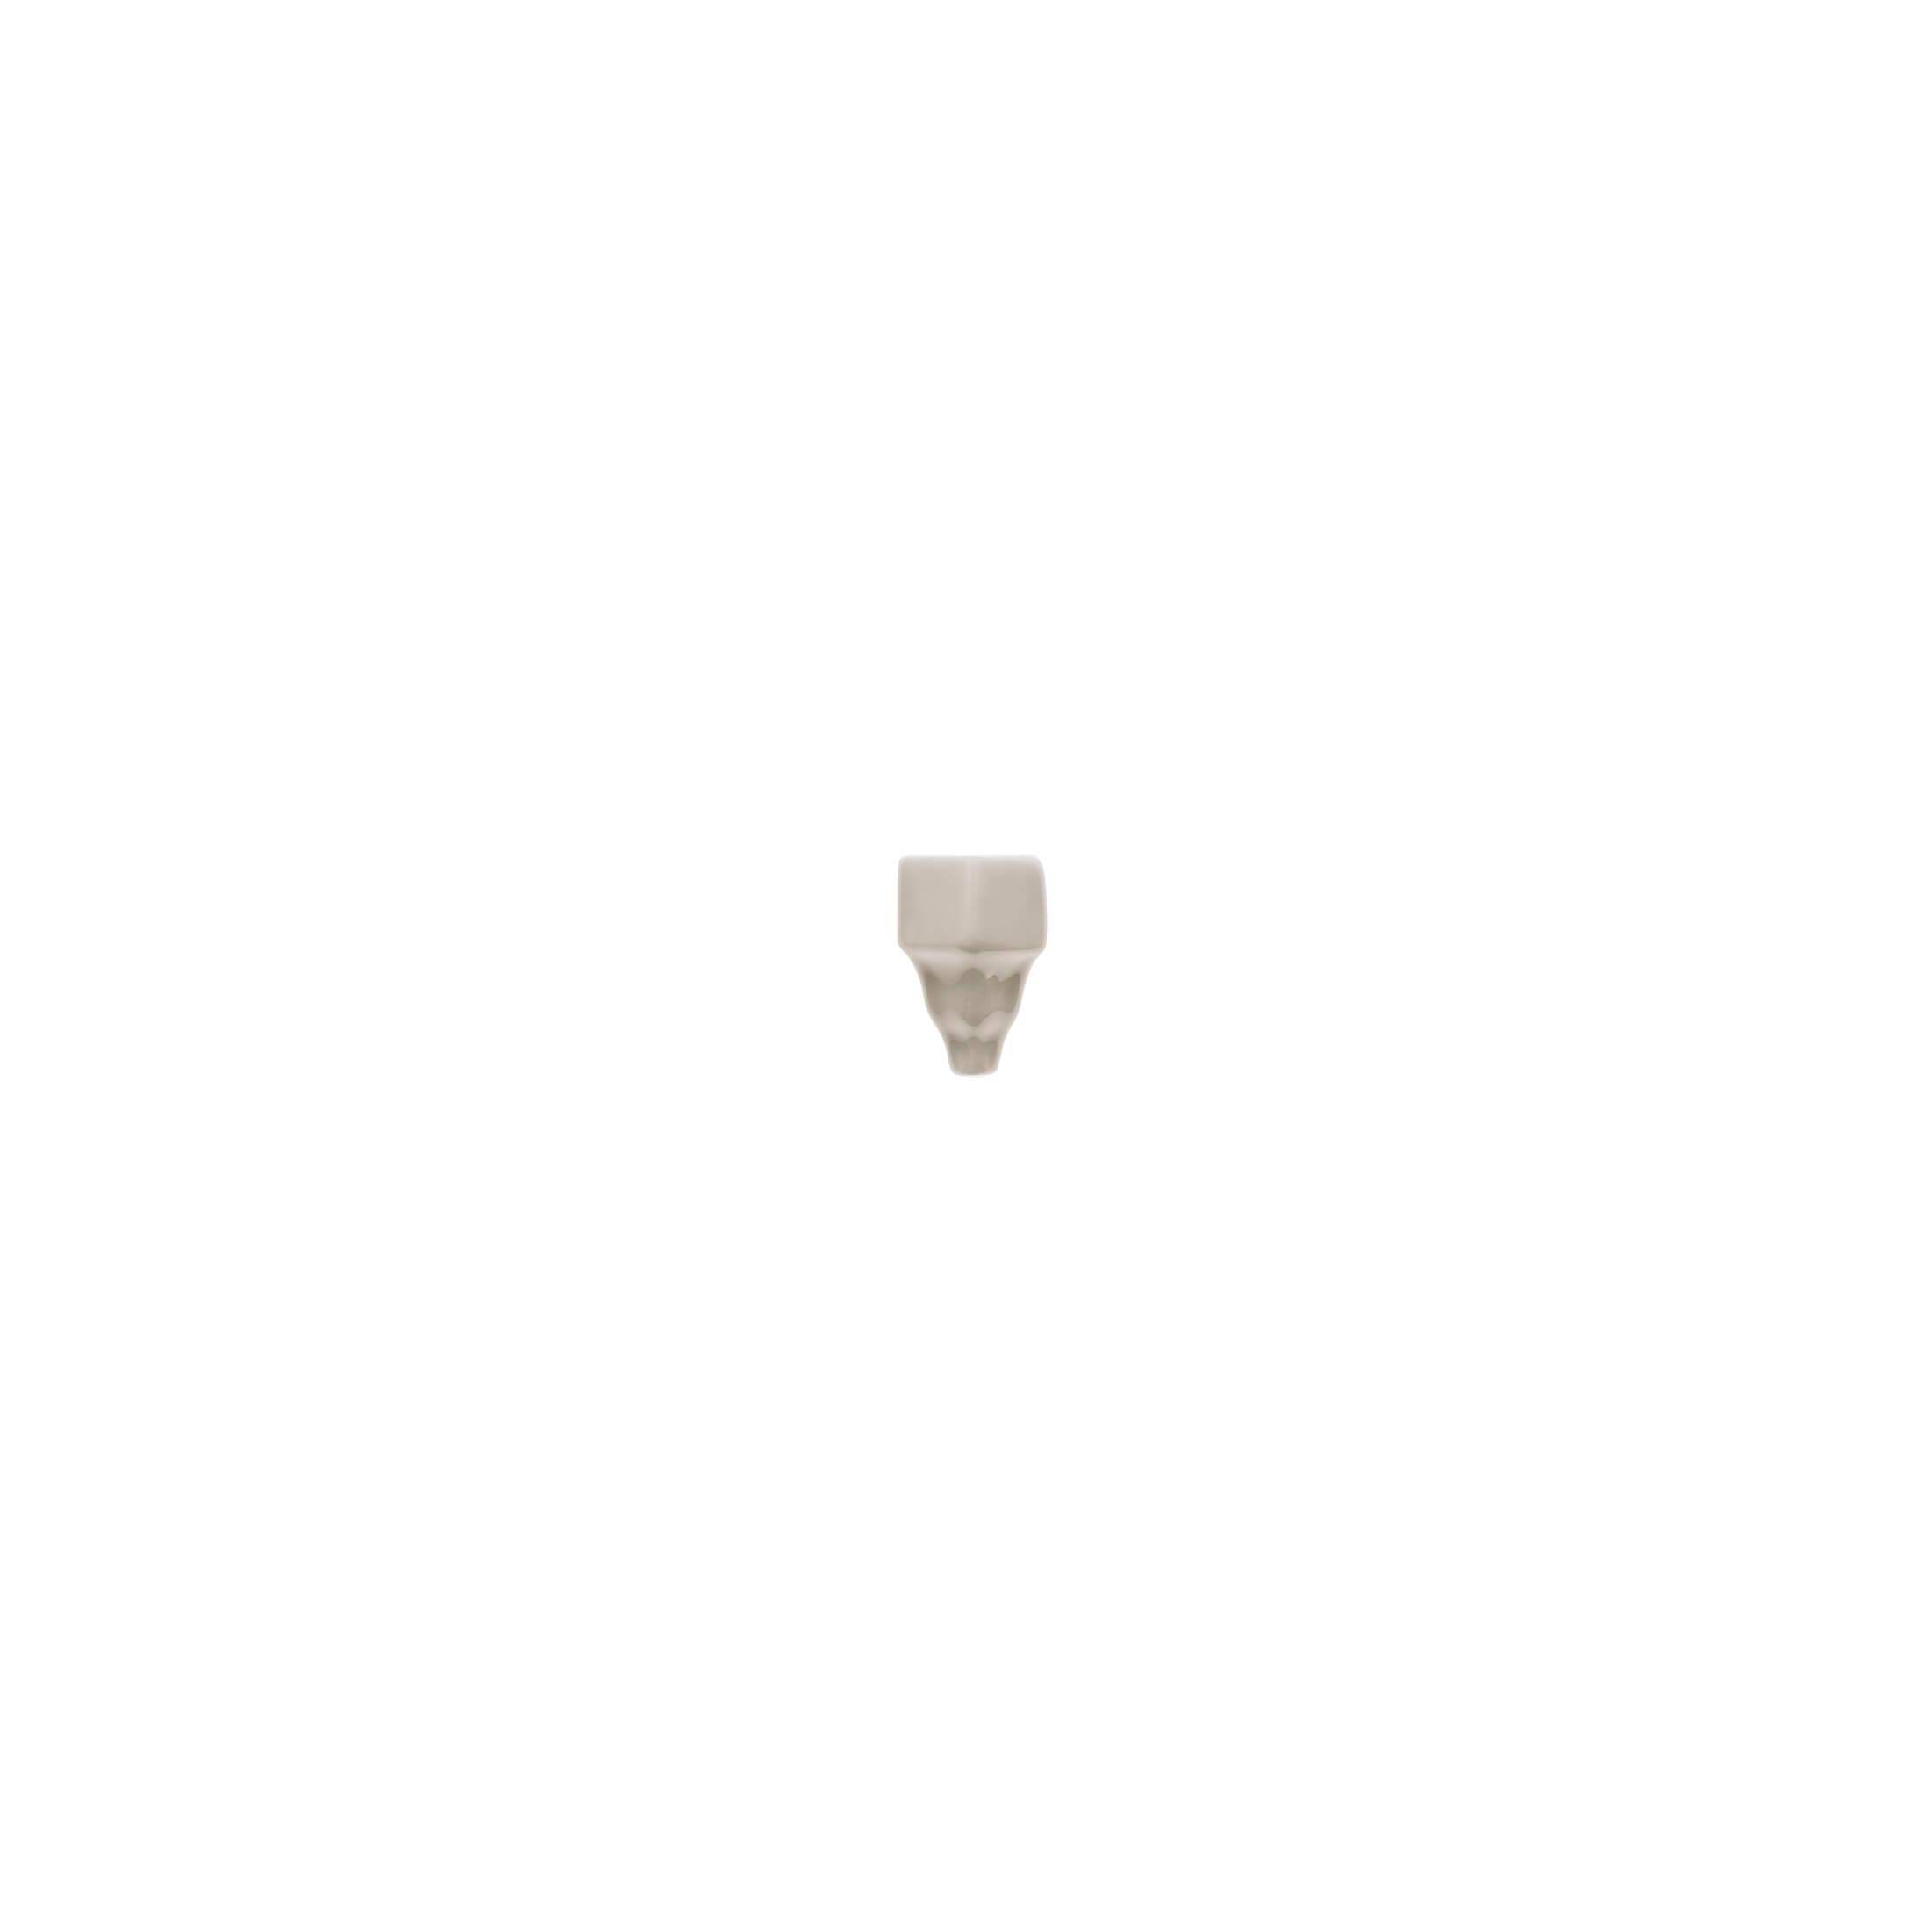 ADNE5505 - ANGULO EXTERIOR CORNISACLASICA - 3.5 cm X 15 cm